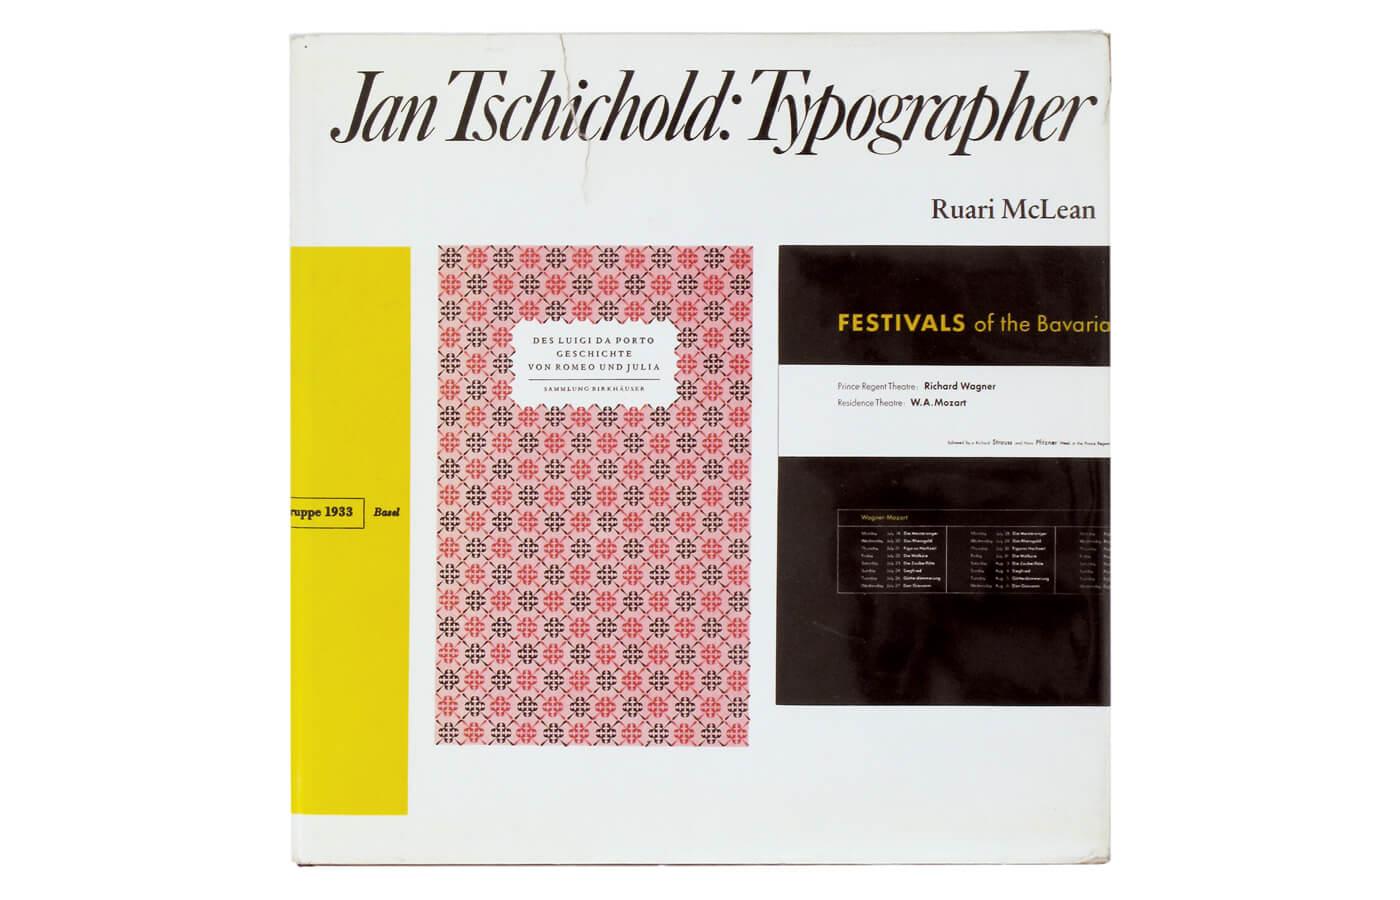 Jan Tschichold: Typographer